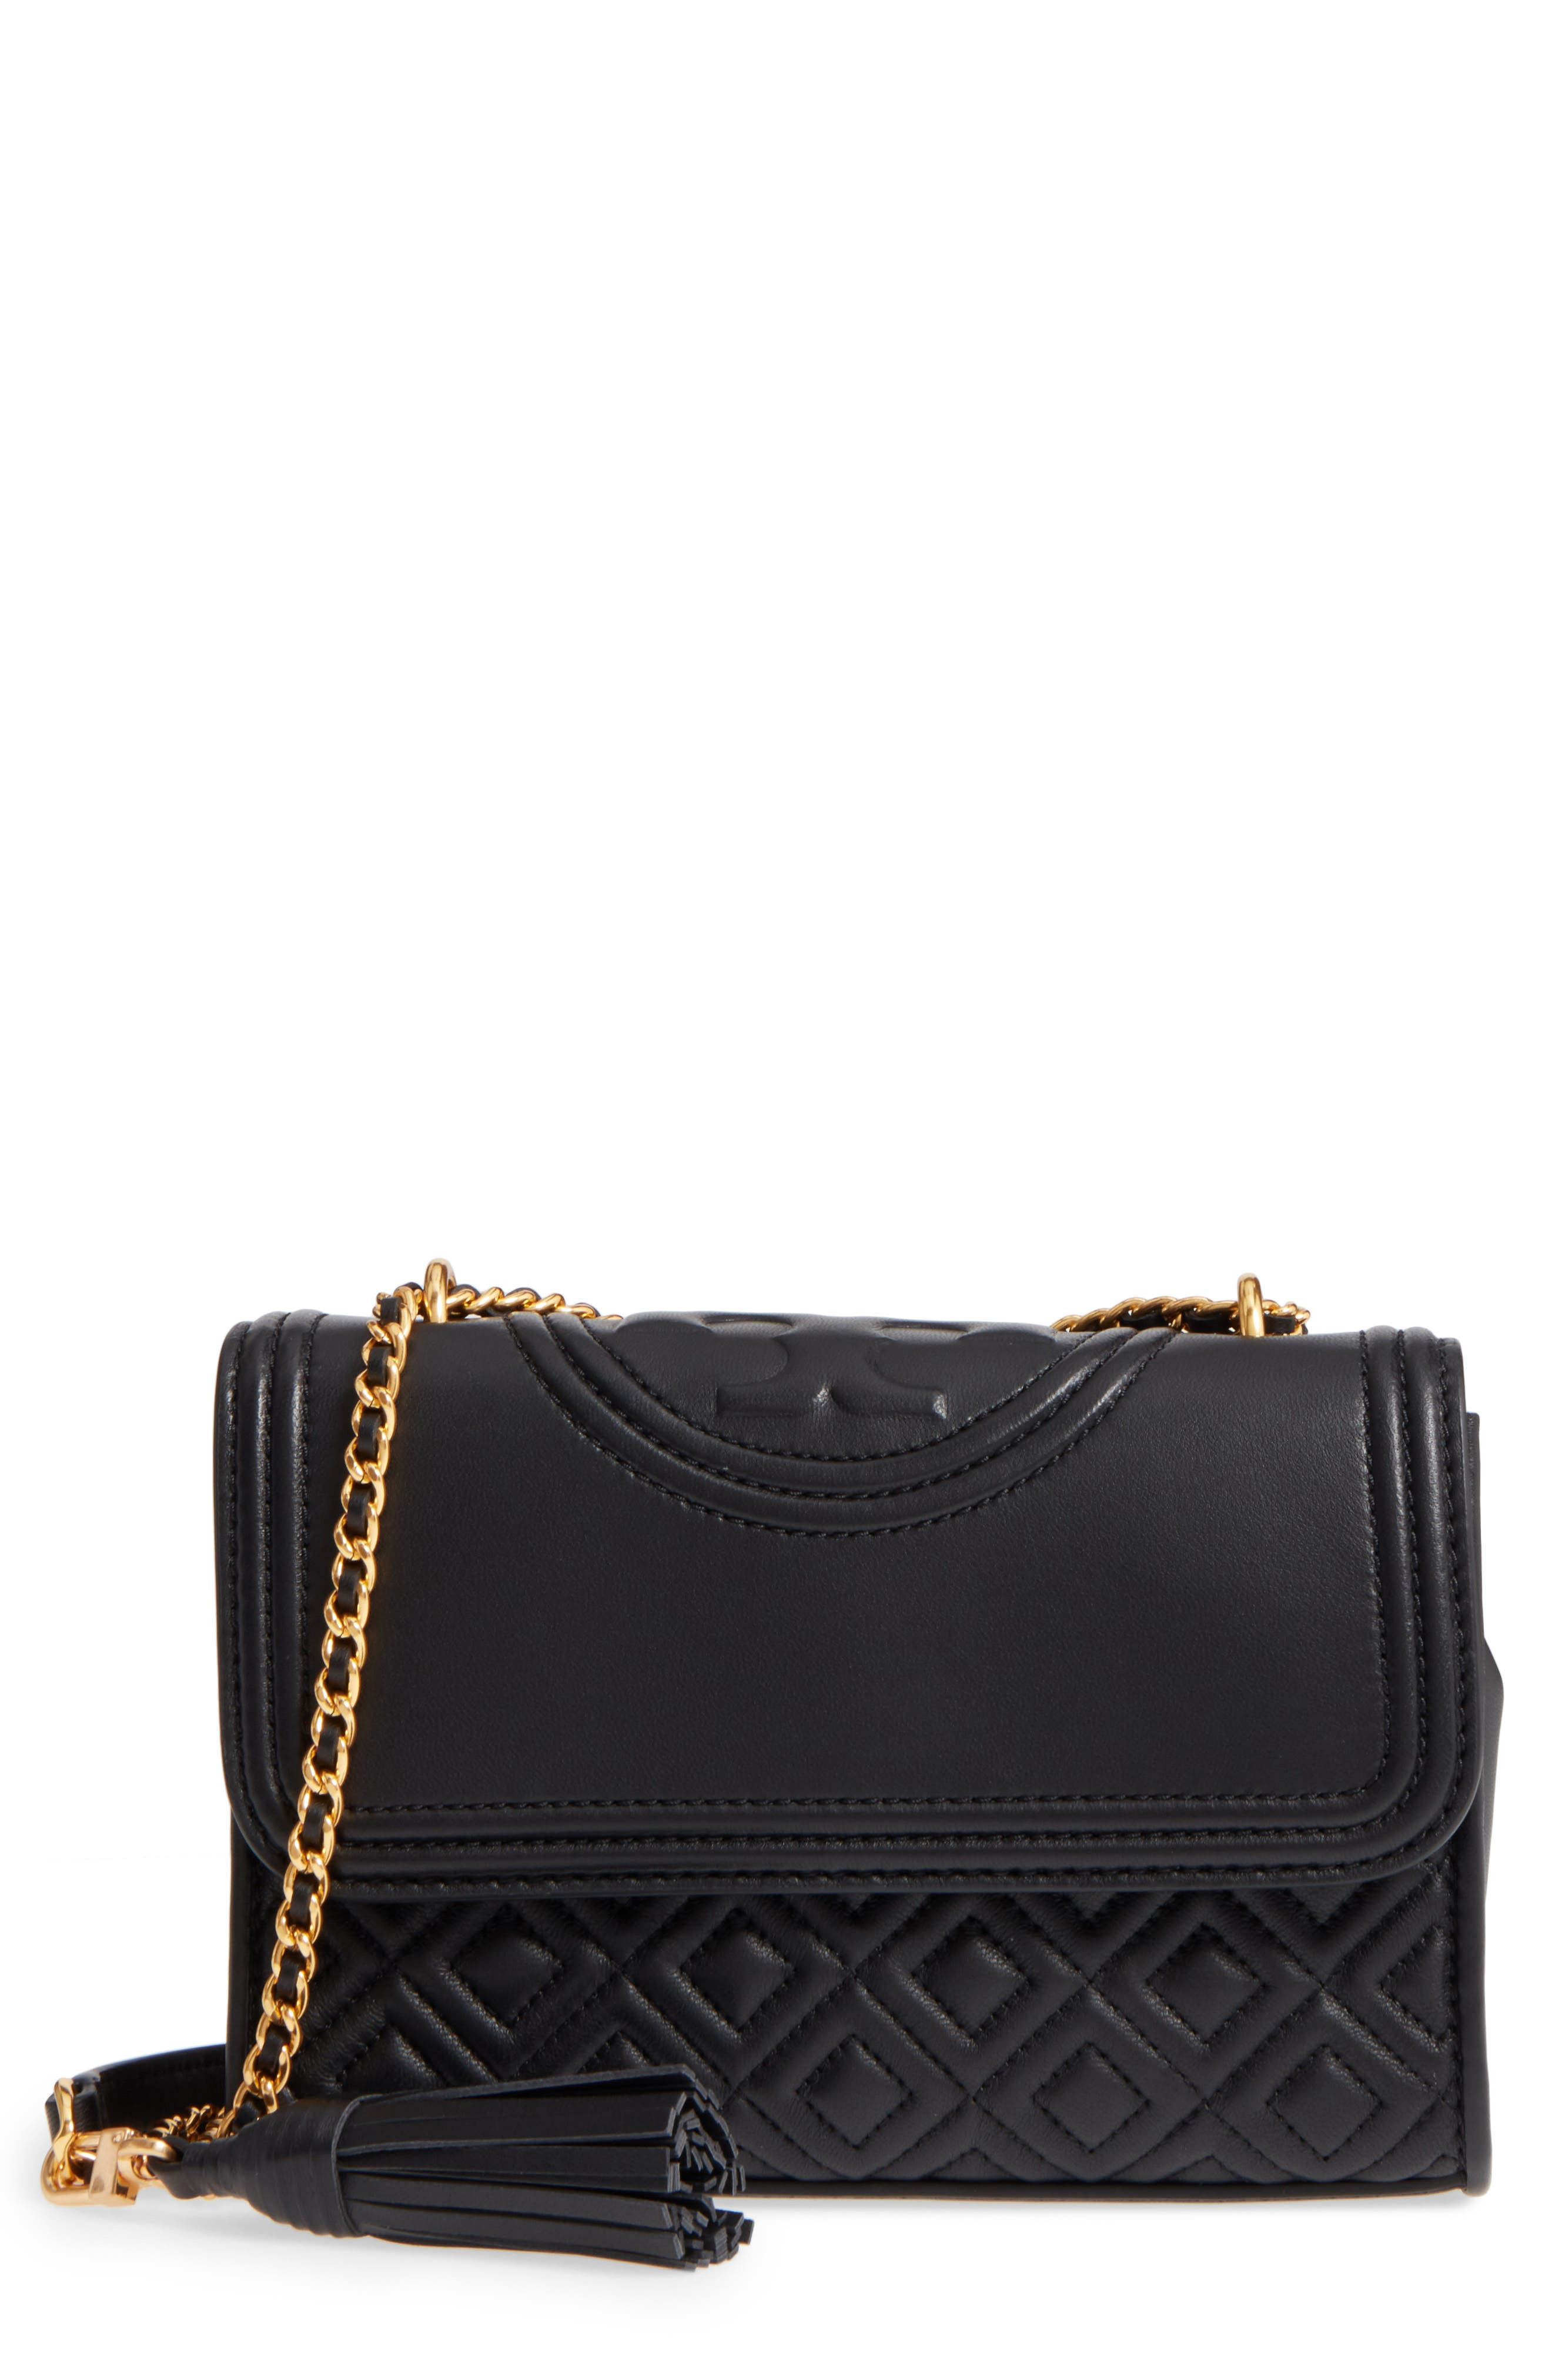 TORY BURCH, Small Fleming Leather Convertible Shoulder Bag, Main thumbnail 1, color, BLACK